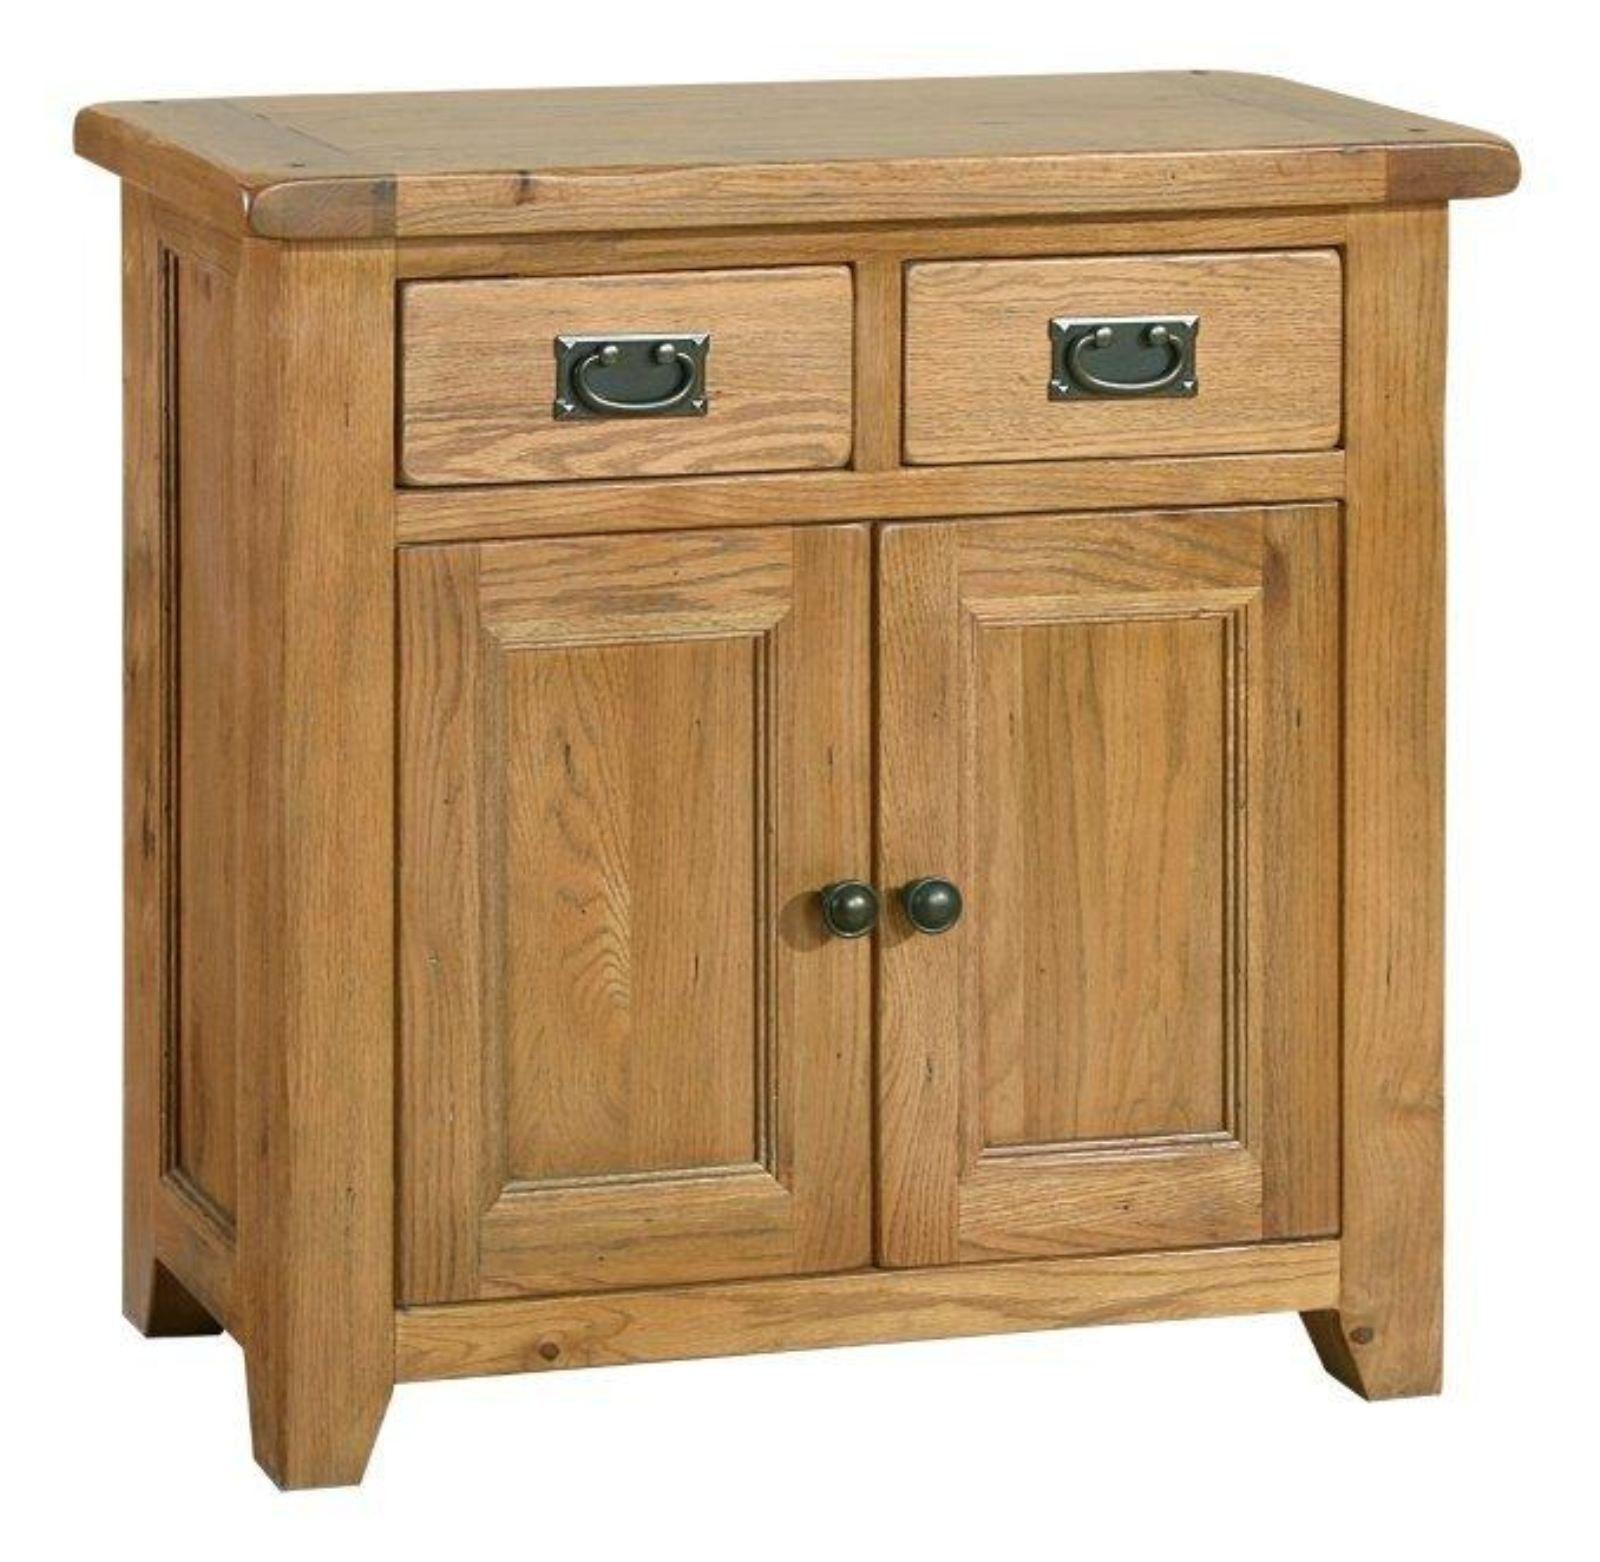 Bordeaux Rustic Oak Furniture Mini Sideboard